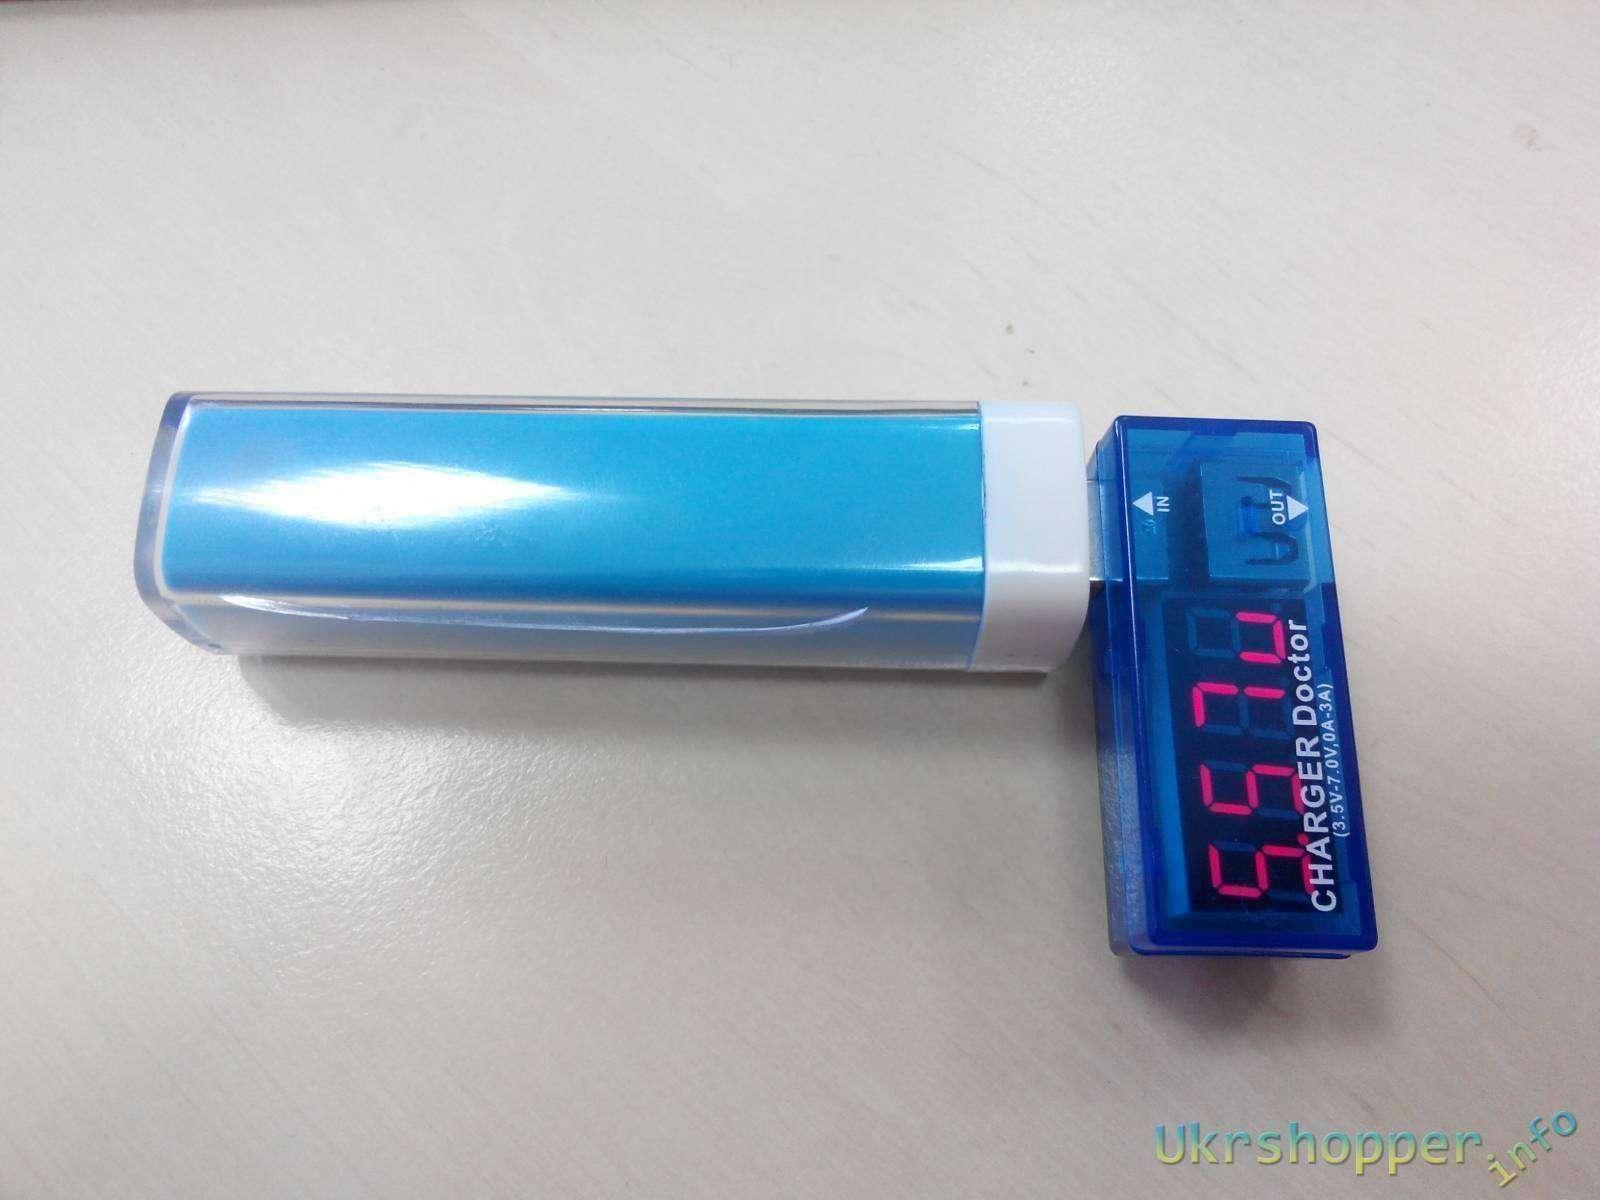 Tmart: 2200MAH 3.7V Universal Lipstick Design Portable Power Source